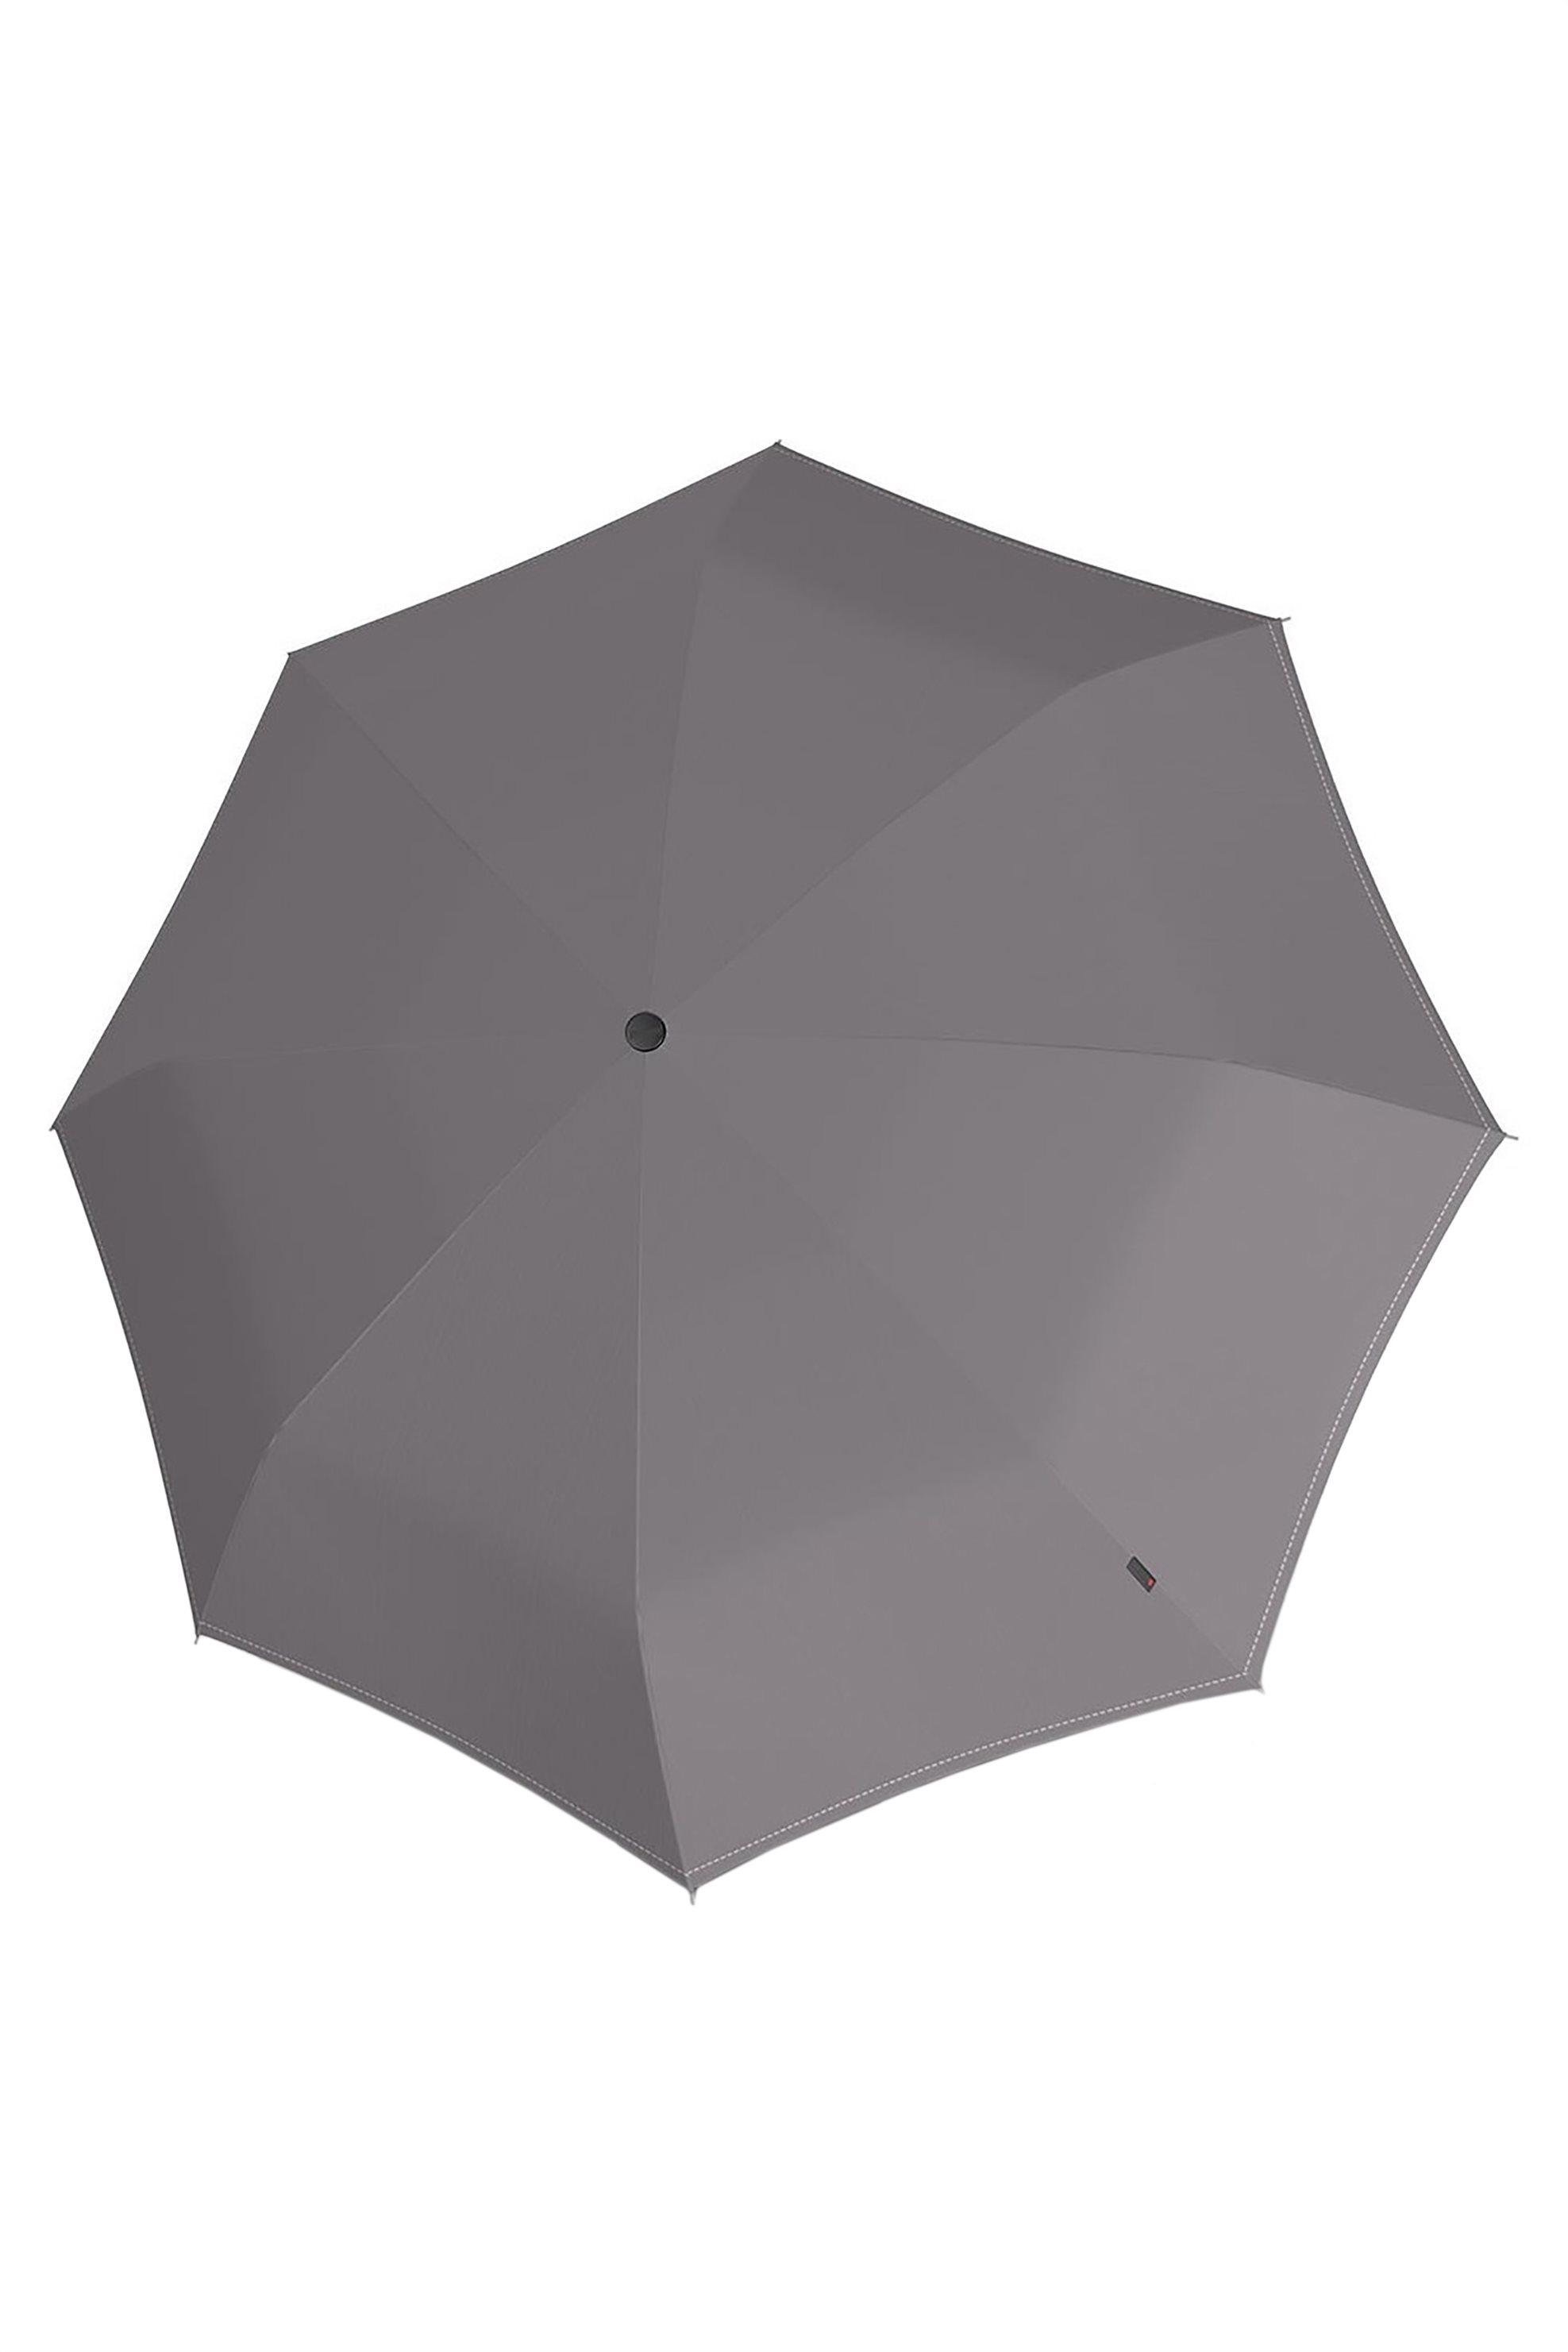 Knirps πτυσσόμενη ομπρέλα ''Duomatic'' - KNUM72008348 - Γκρι